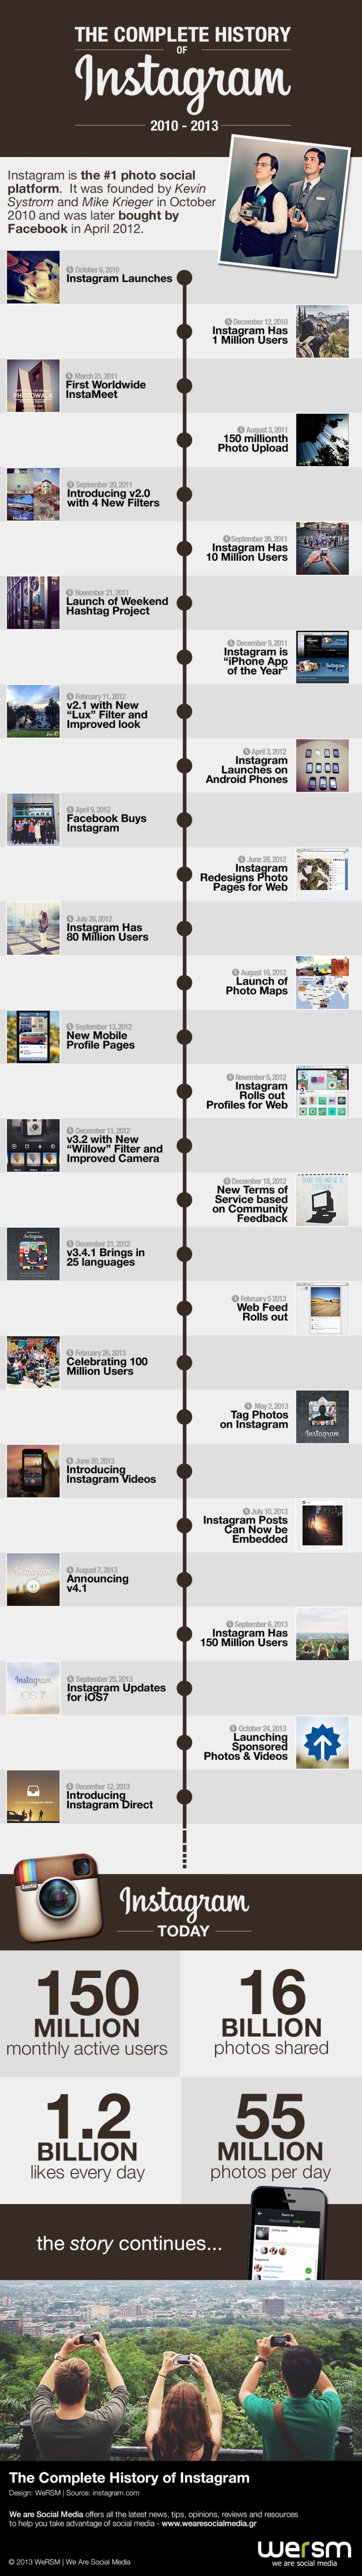 The complete history of Instagram #infografia #infographic #socialmedia